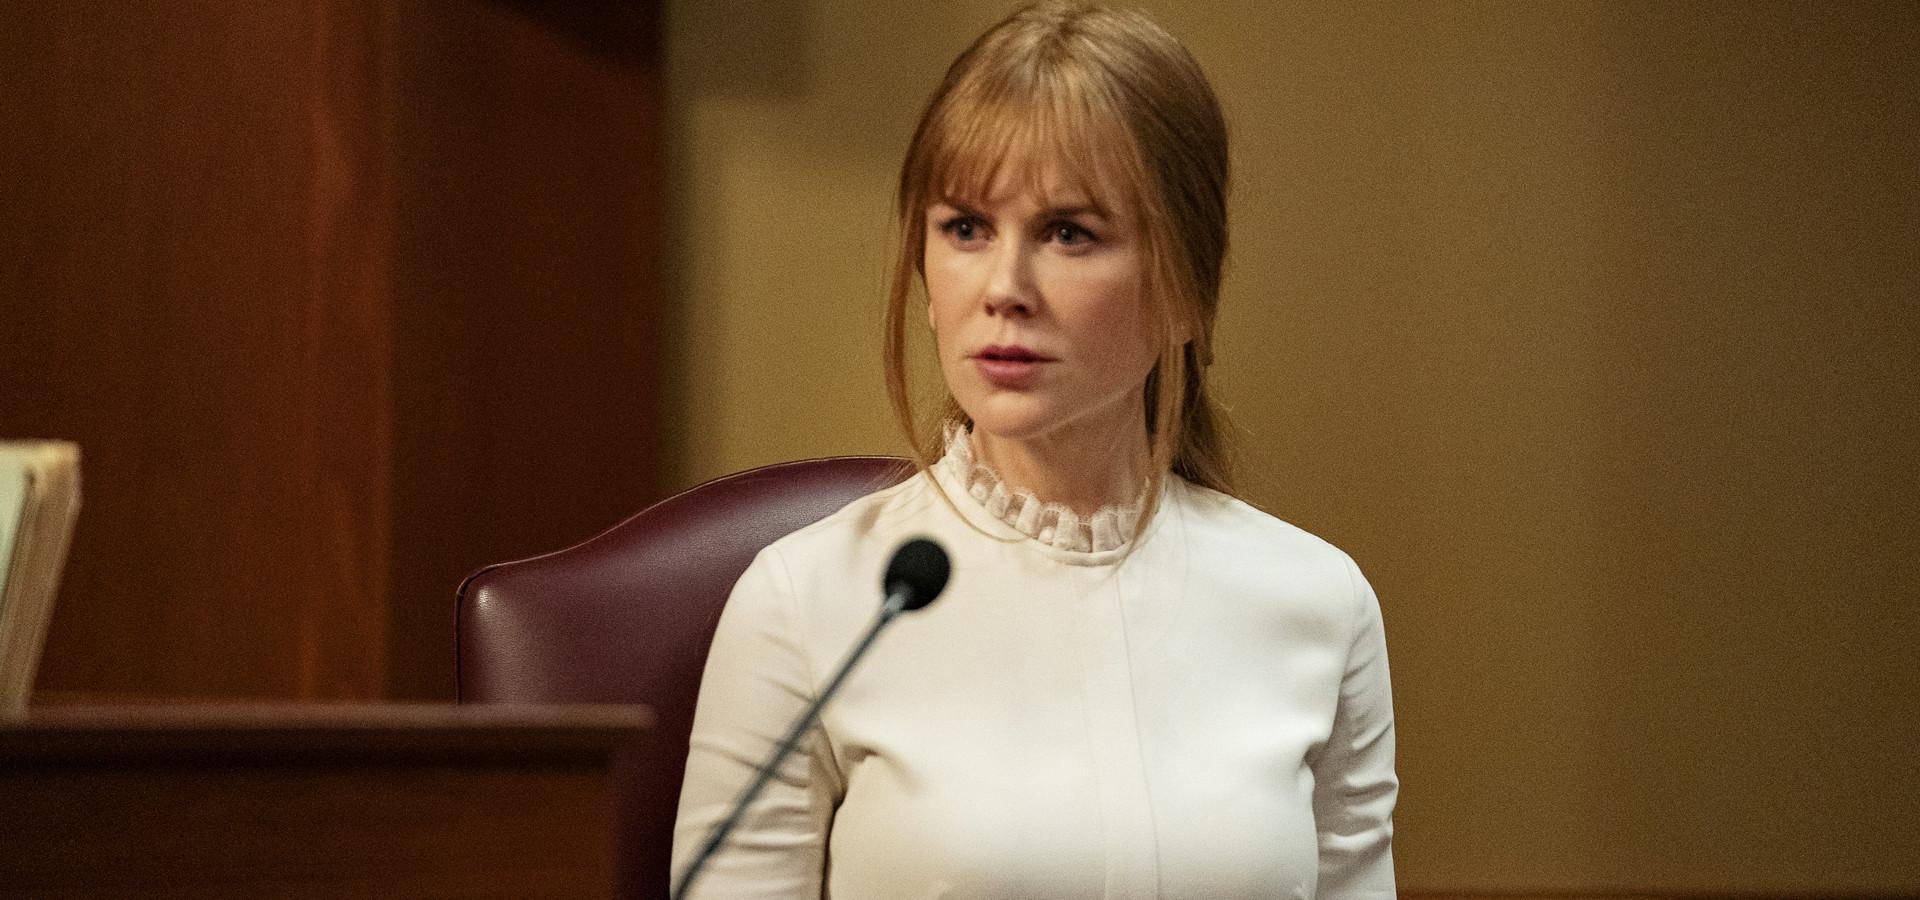 Nicole Kidman Weighs in on Possible Big Little Lies Season 3 ...